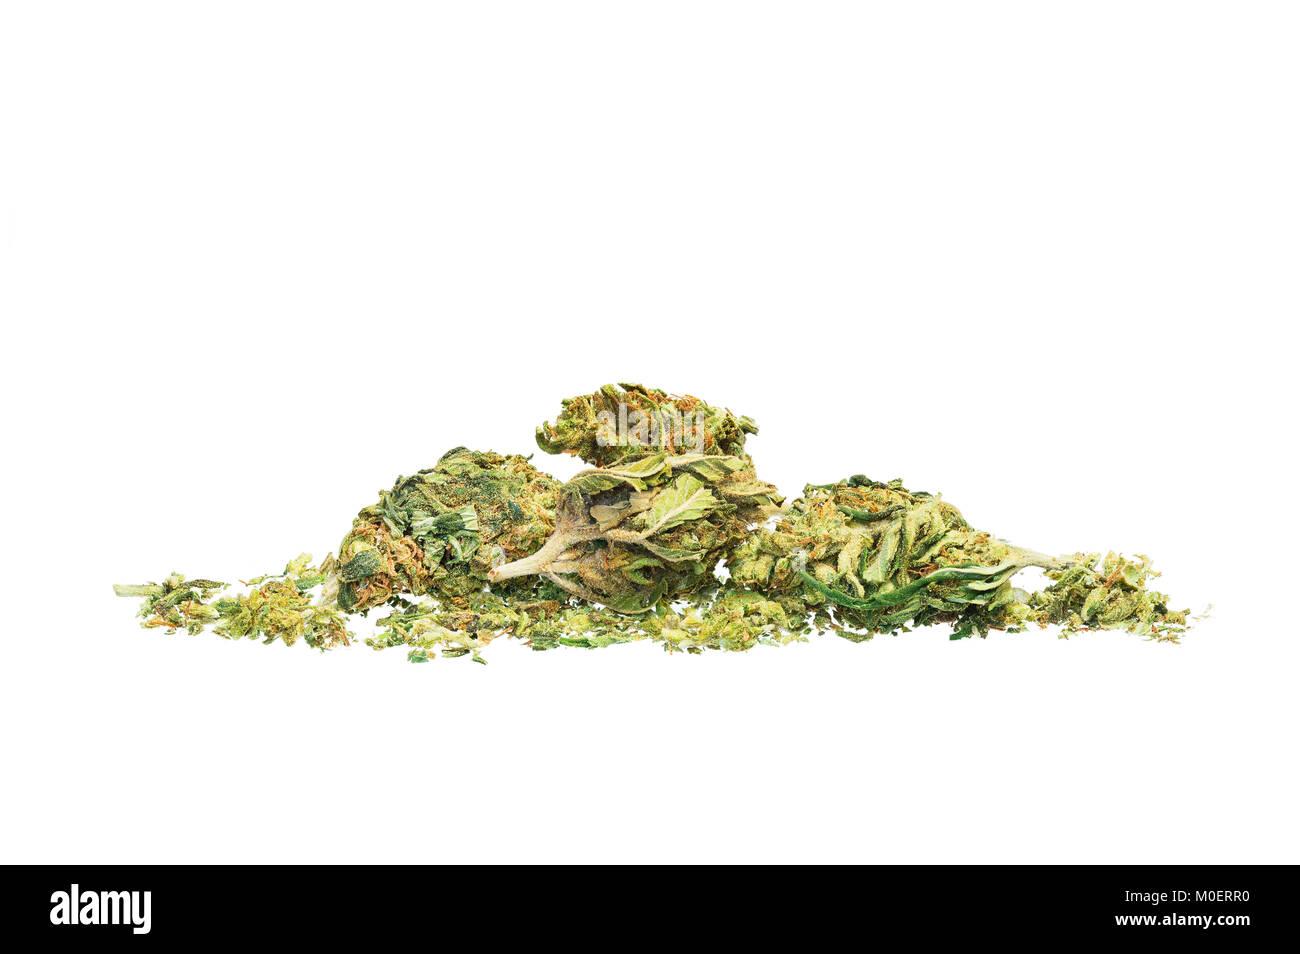 High grade marijuana against a white background - Stock Image